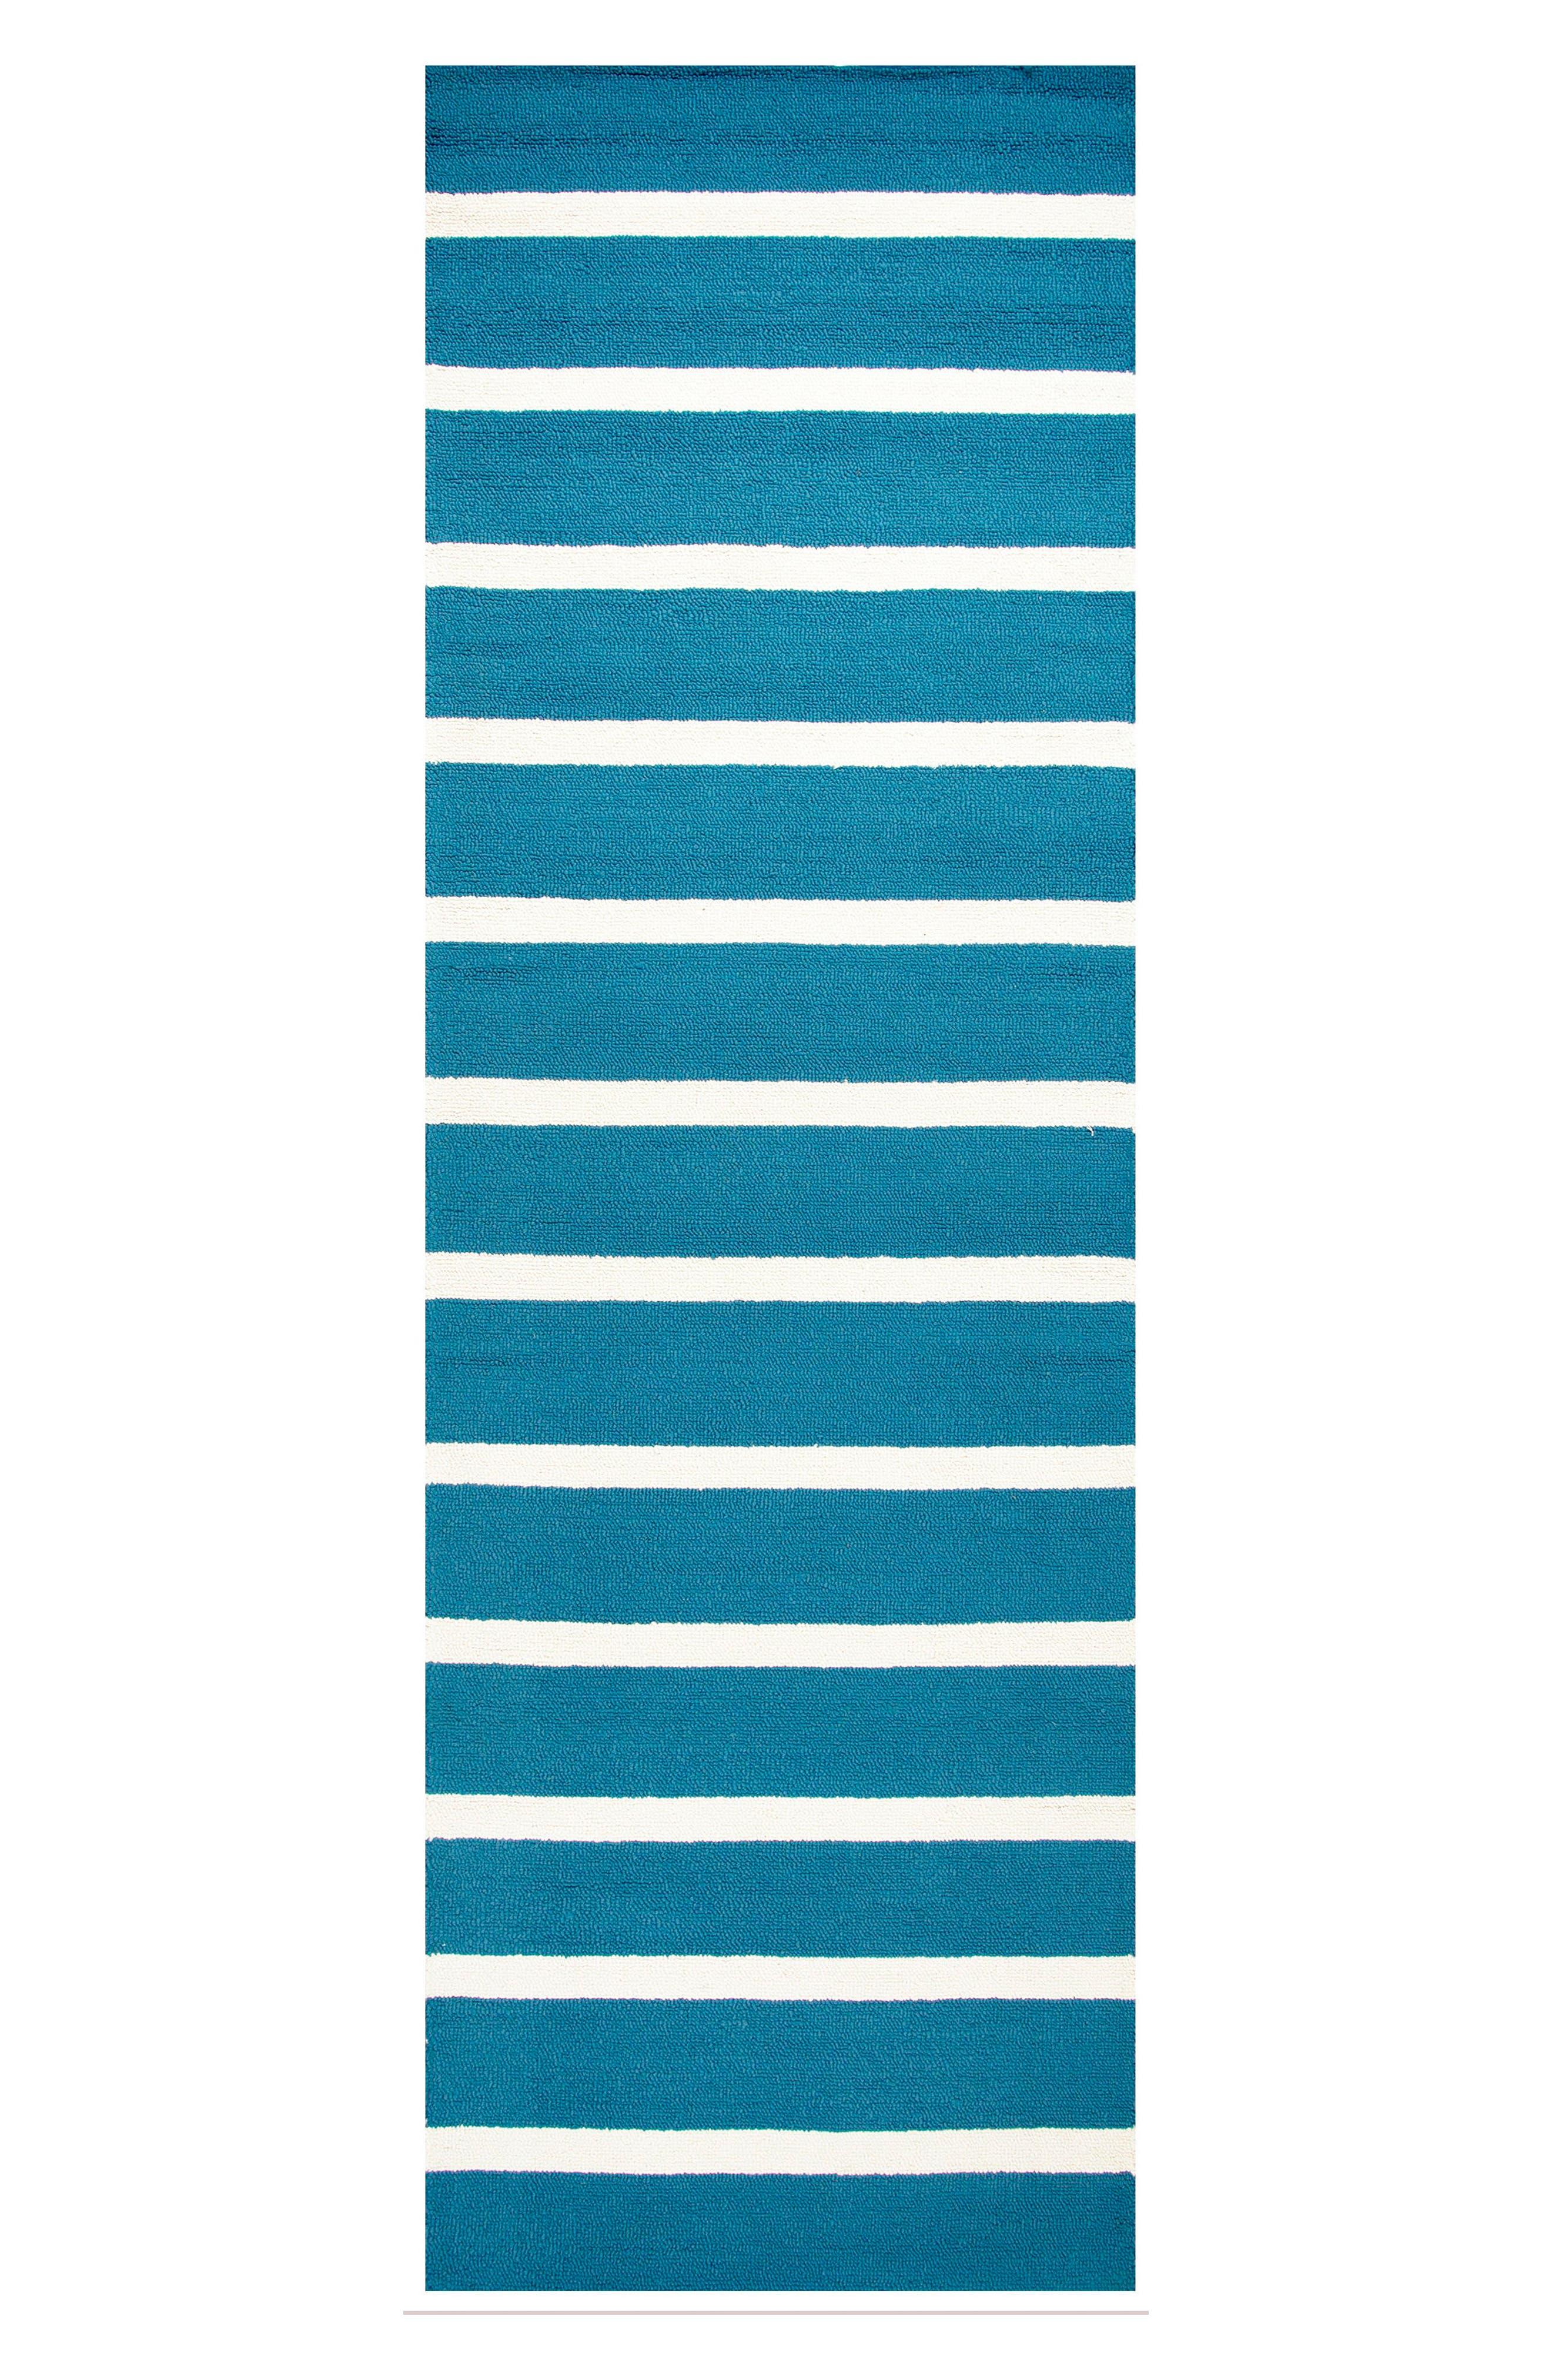 Azzura Hill Jenny Hand Tufted Rug,                             Alternate thumbnail 3, color,                             Marine Blue